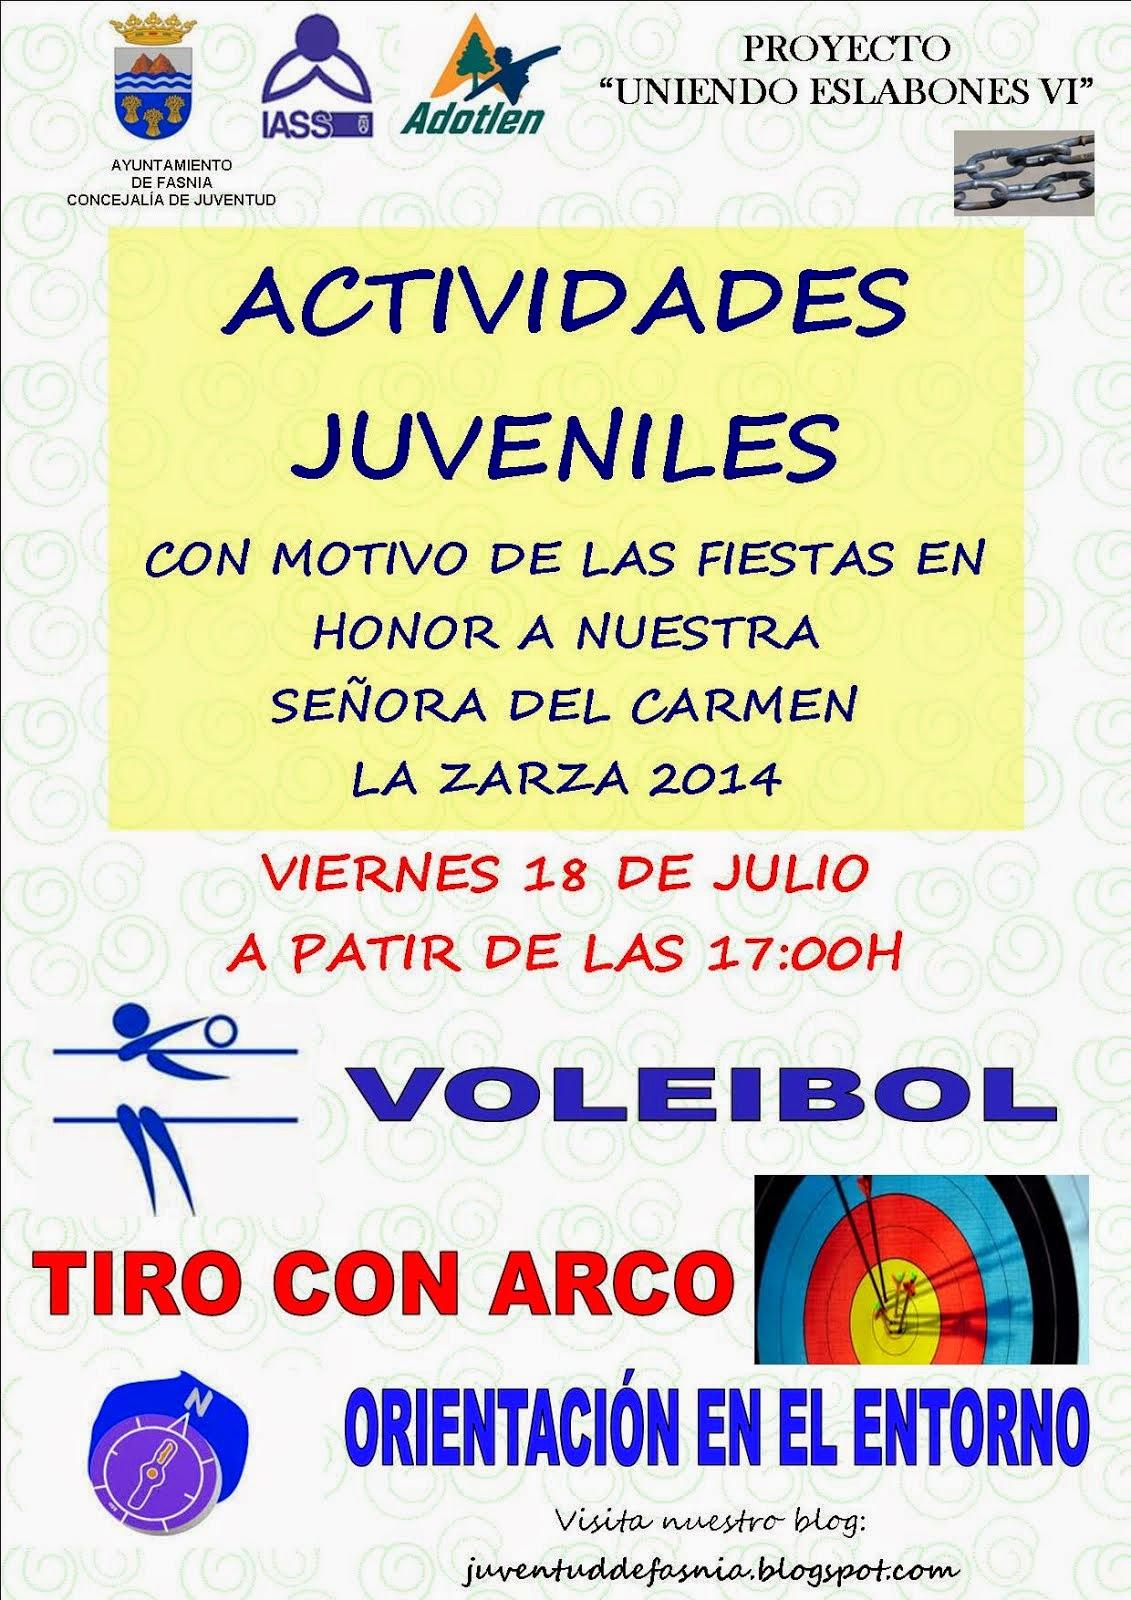 ACTIVIDADES JUVENILES LA ZARZA 2014